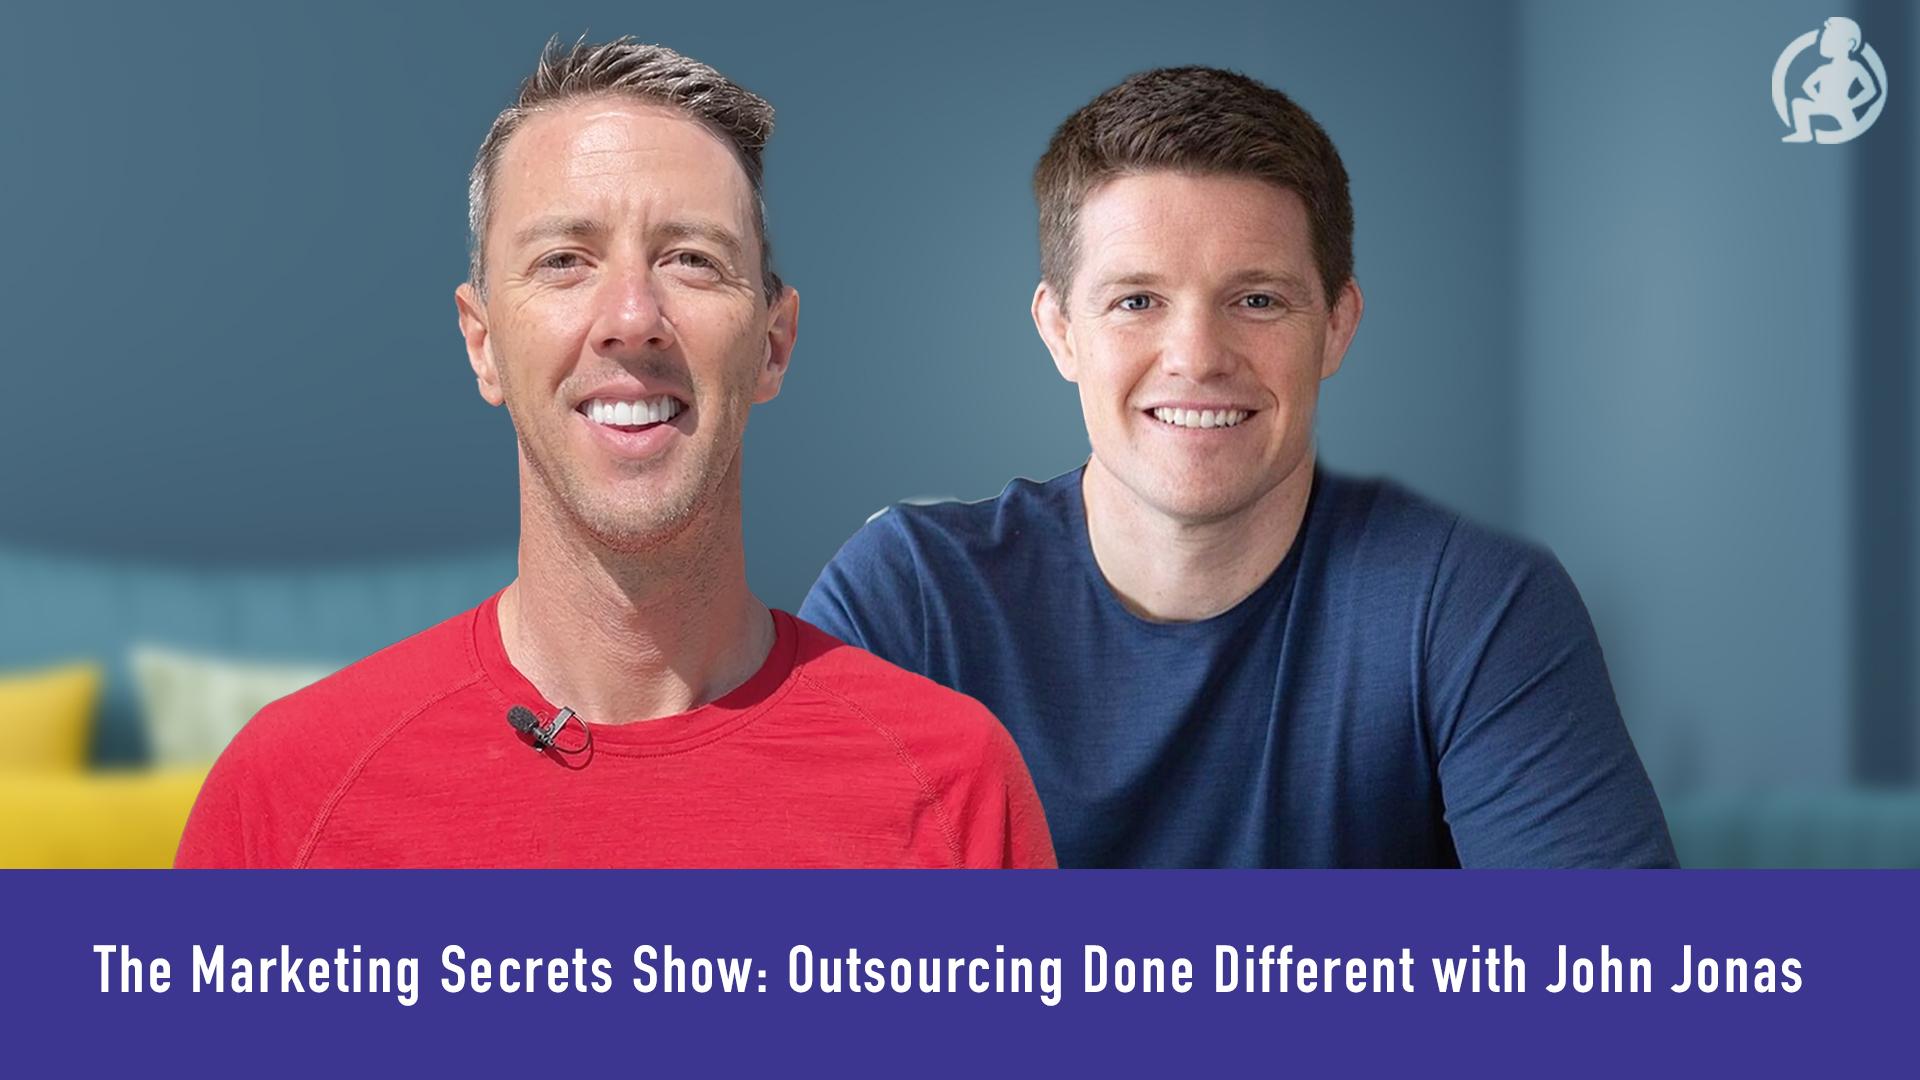 Podcast (The Marketing Secrets Show)